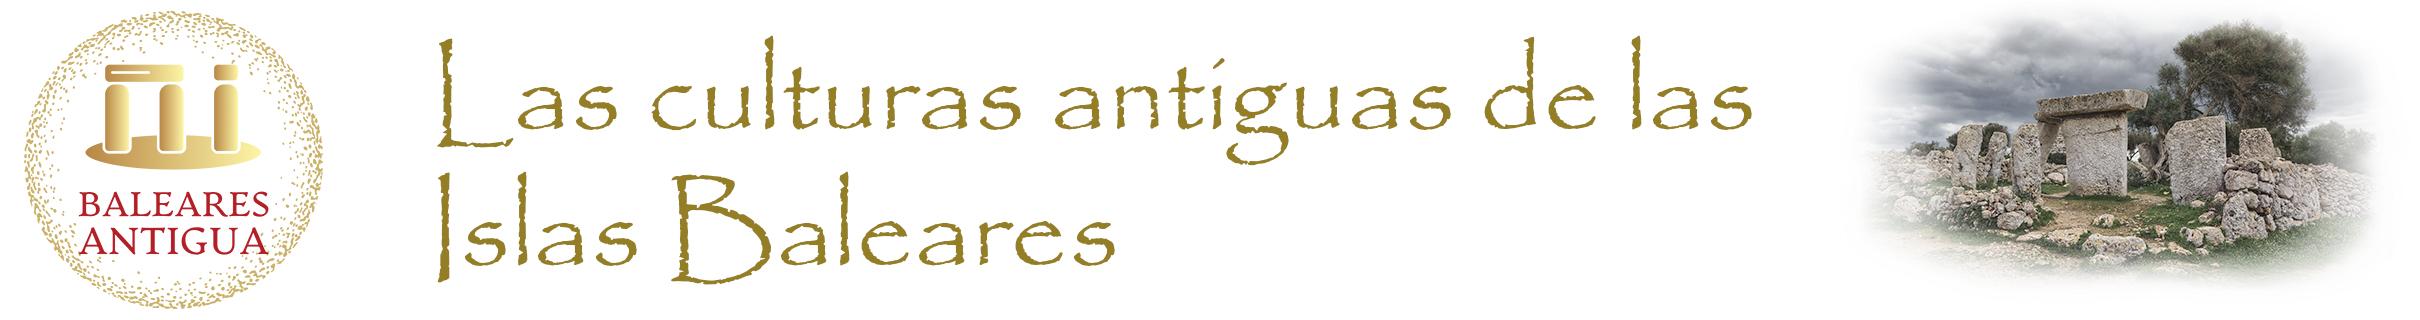 Baleares Antigua